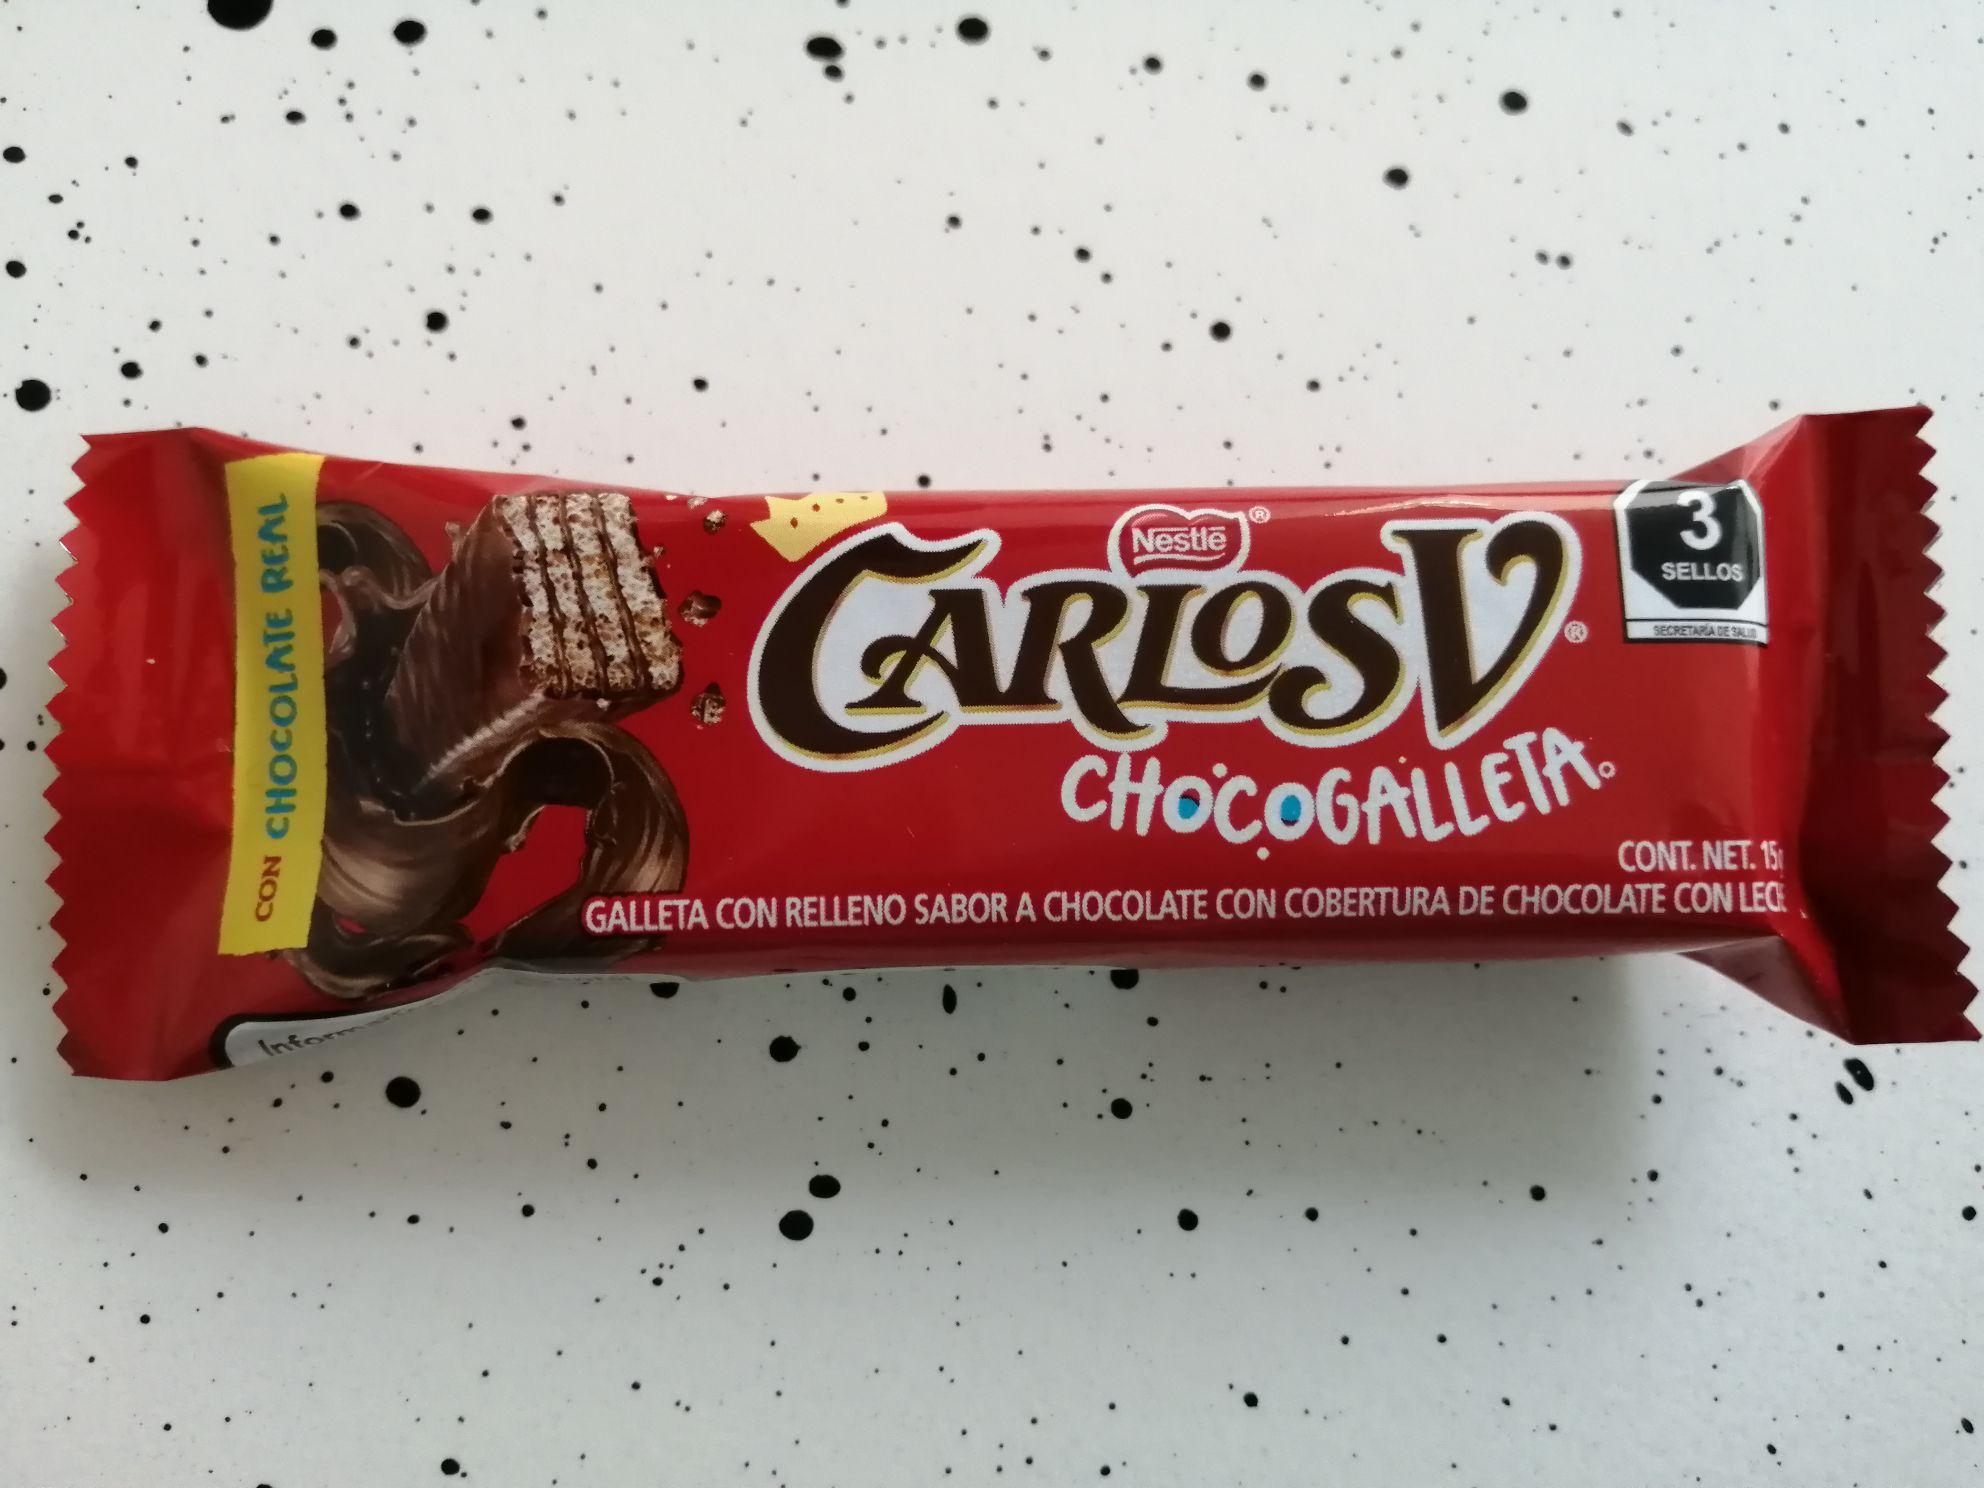 Walmart Aguascalientes: Chocogalleta Carlos V Promonovela